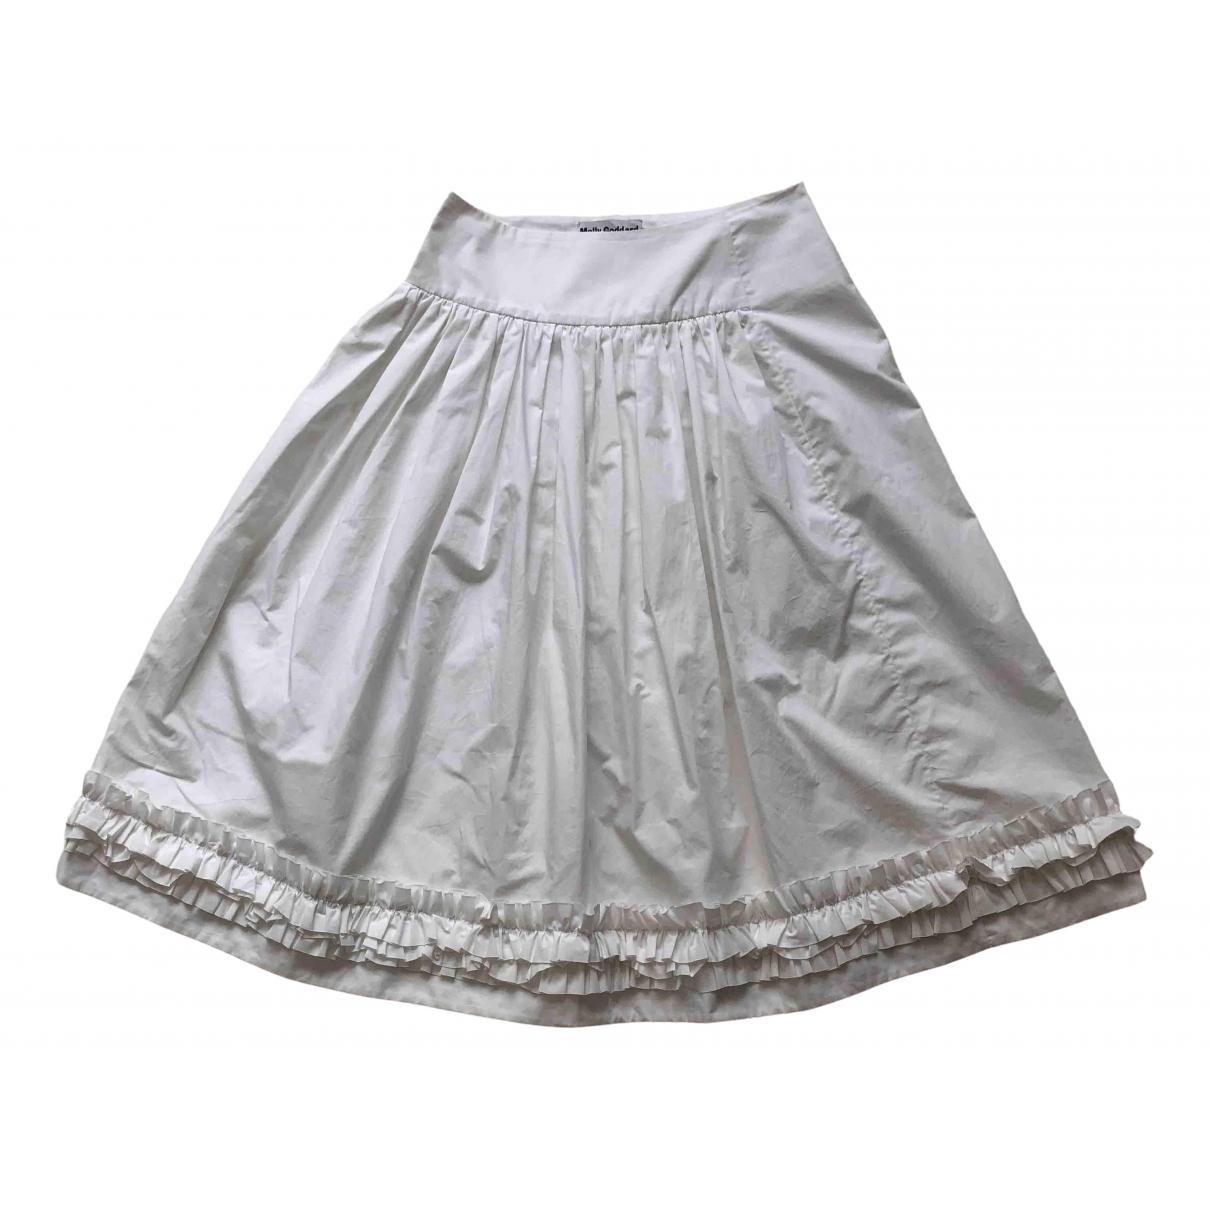 Molly Goddard - Jupe   pour femme en coton - blanc